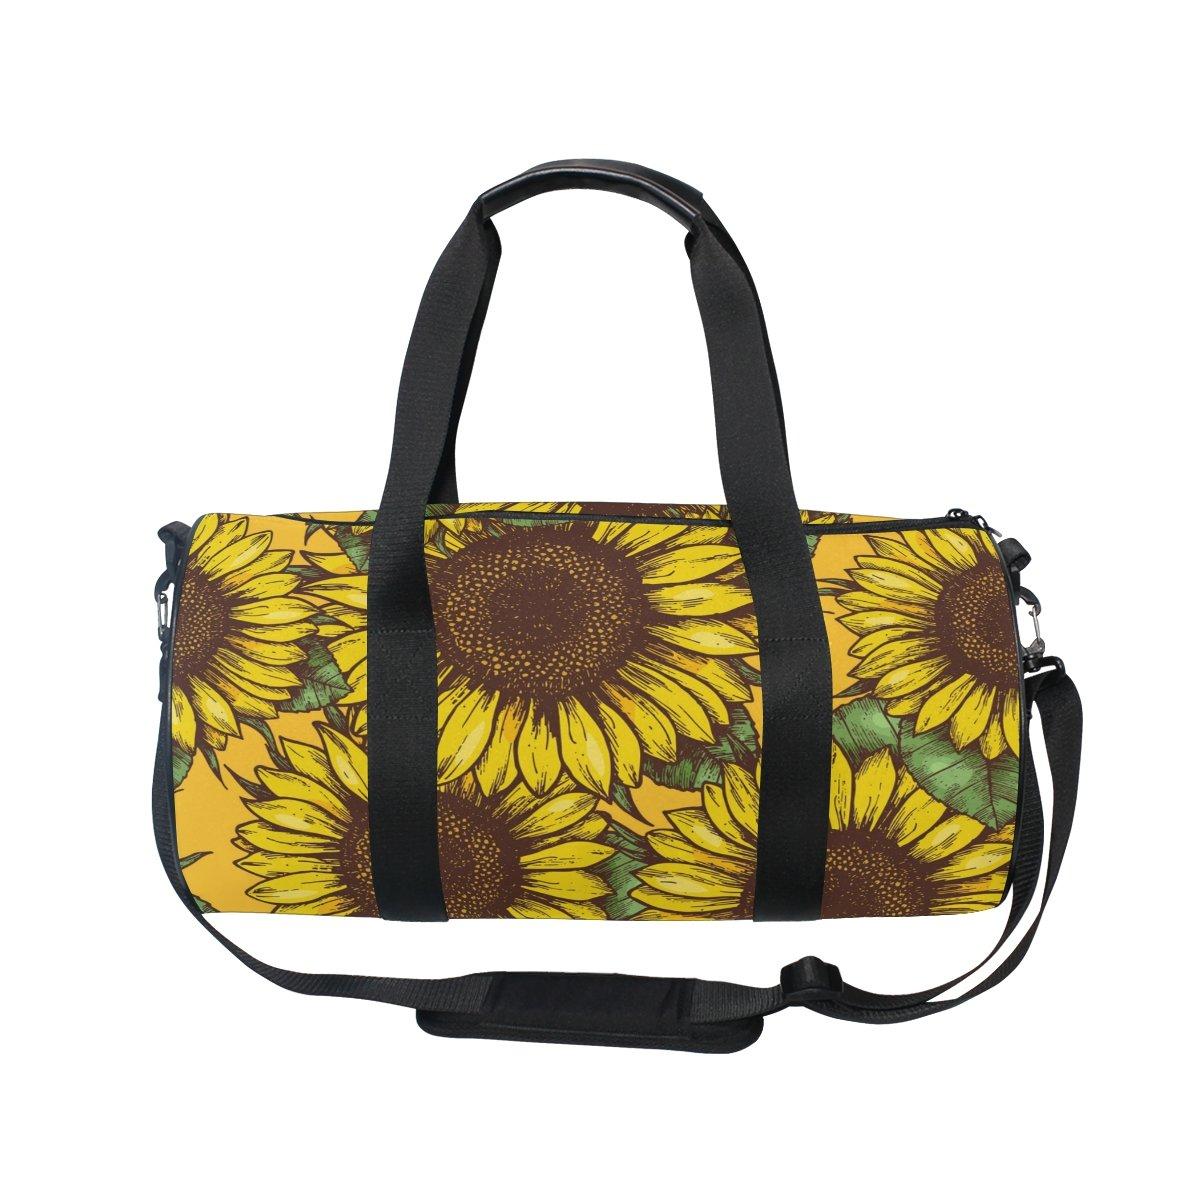 Cooper girl Summer Sunflowers Duffels Bag Travel Sport Gym Bag